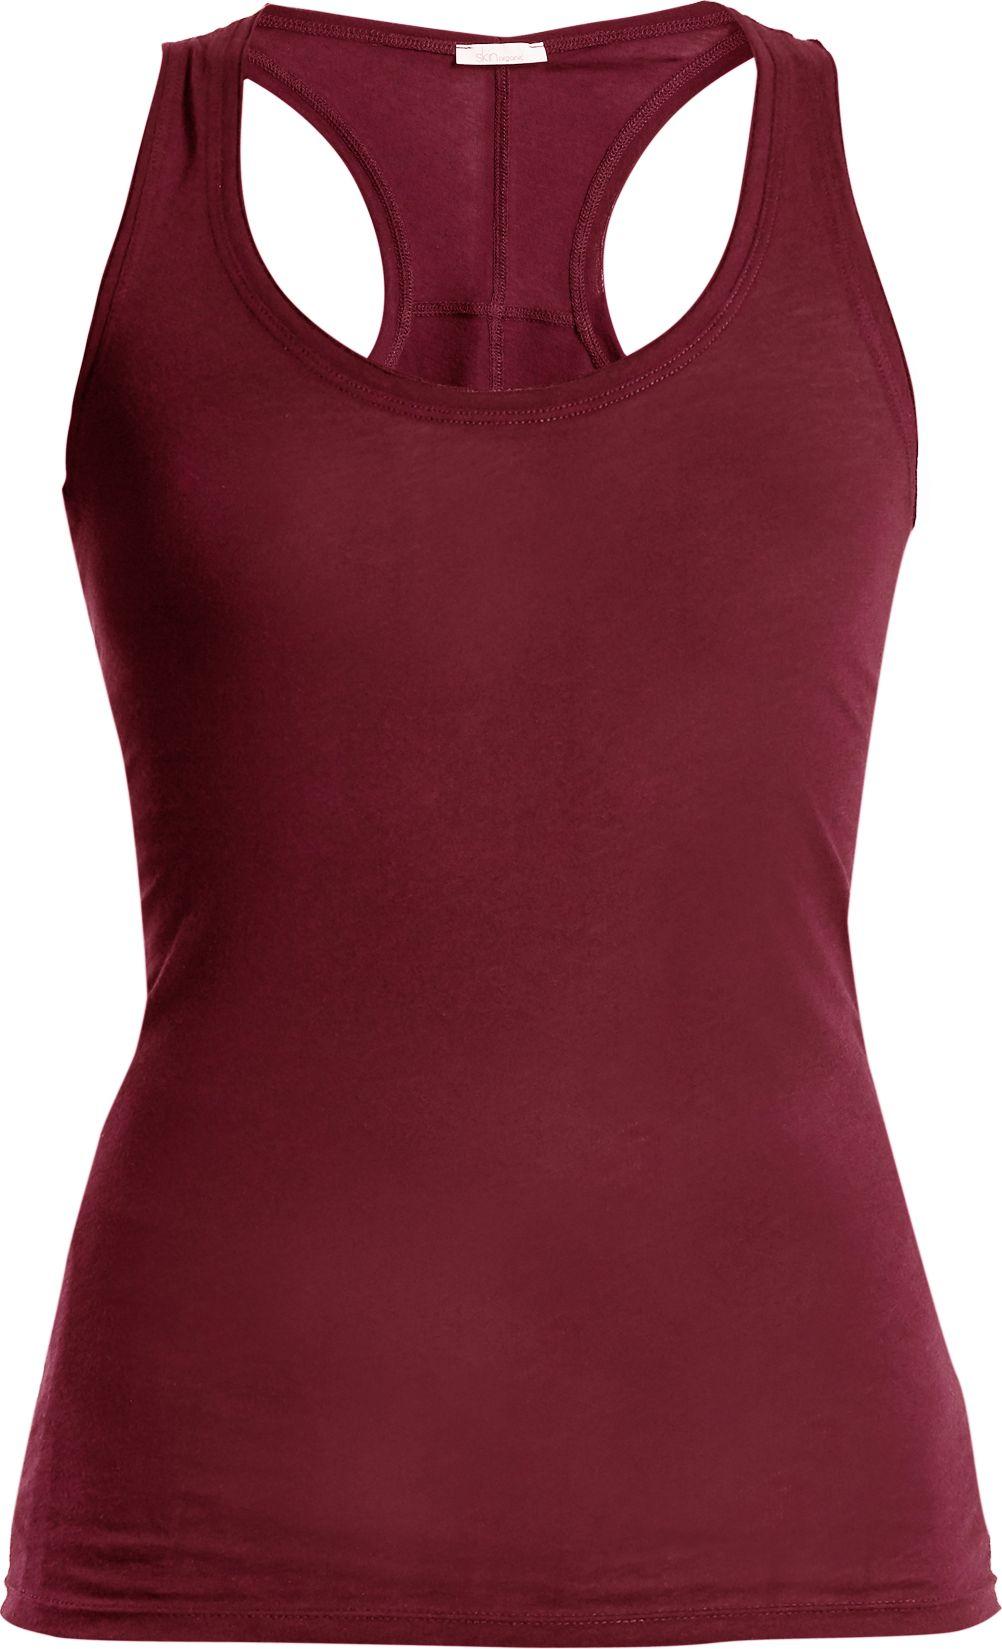 SKIN - Cotton-jersey tank top